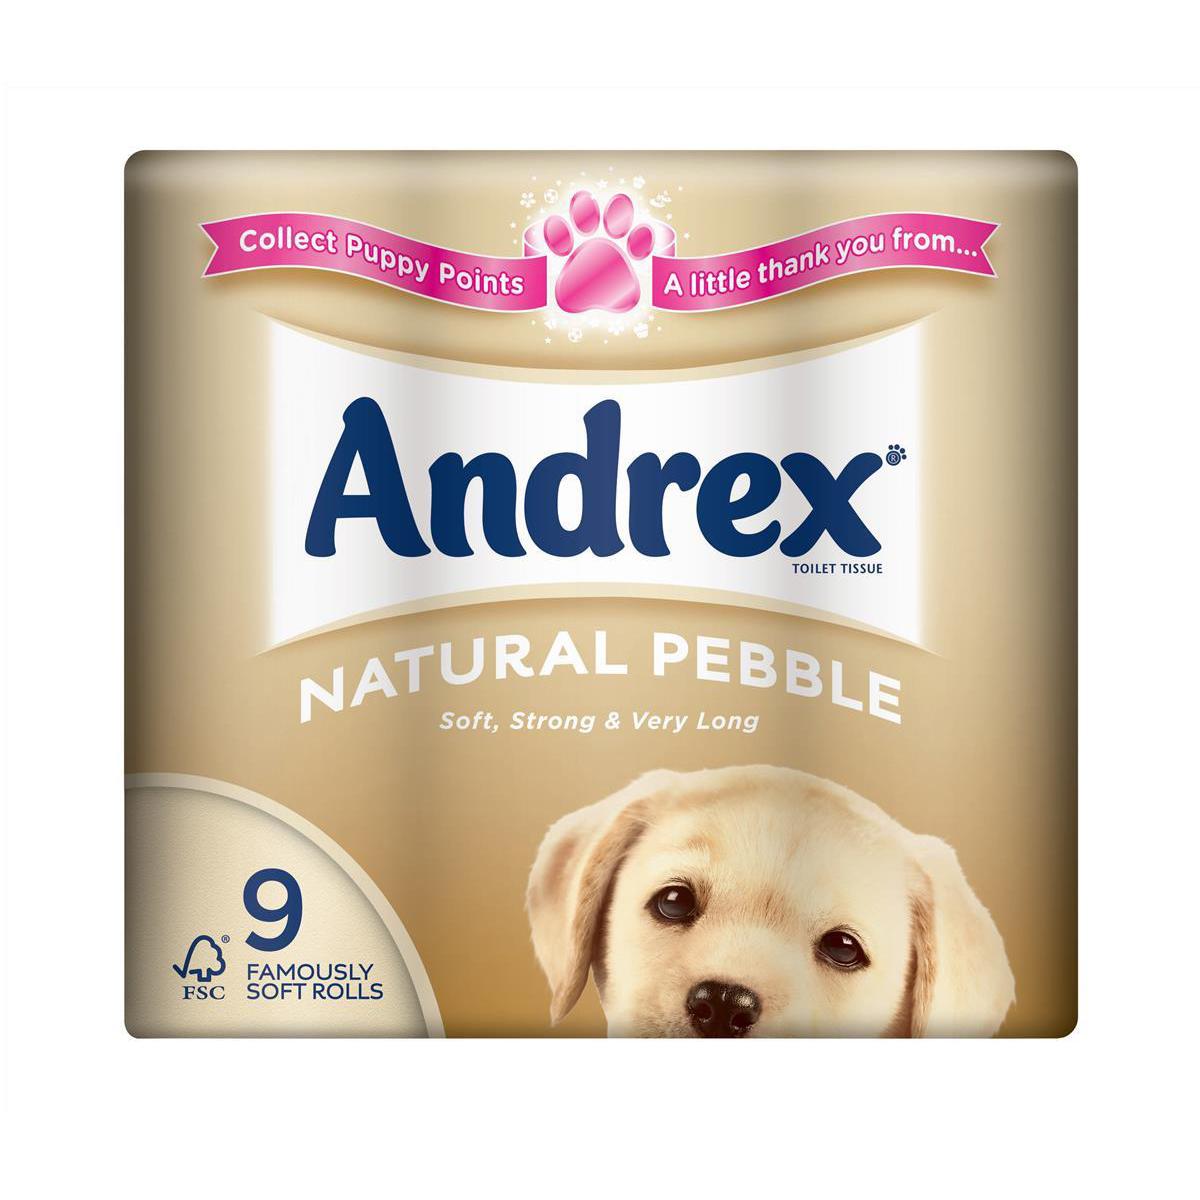 Andrex TRoll Natural Pebble Pack 9 Code VKC4974125